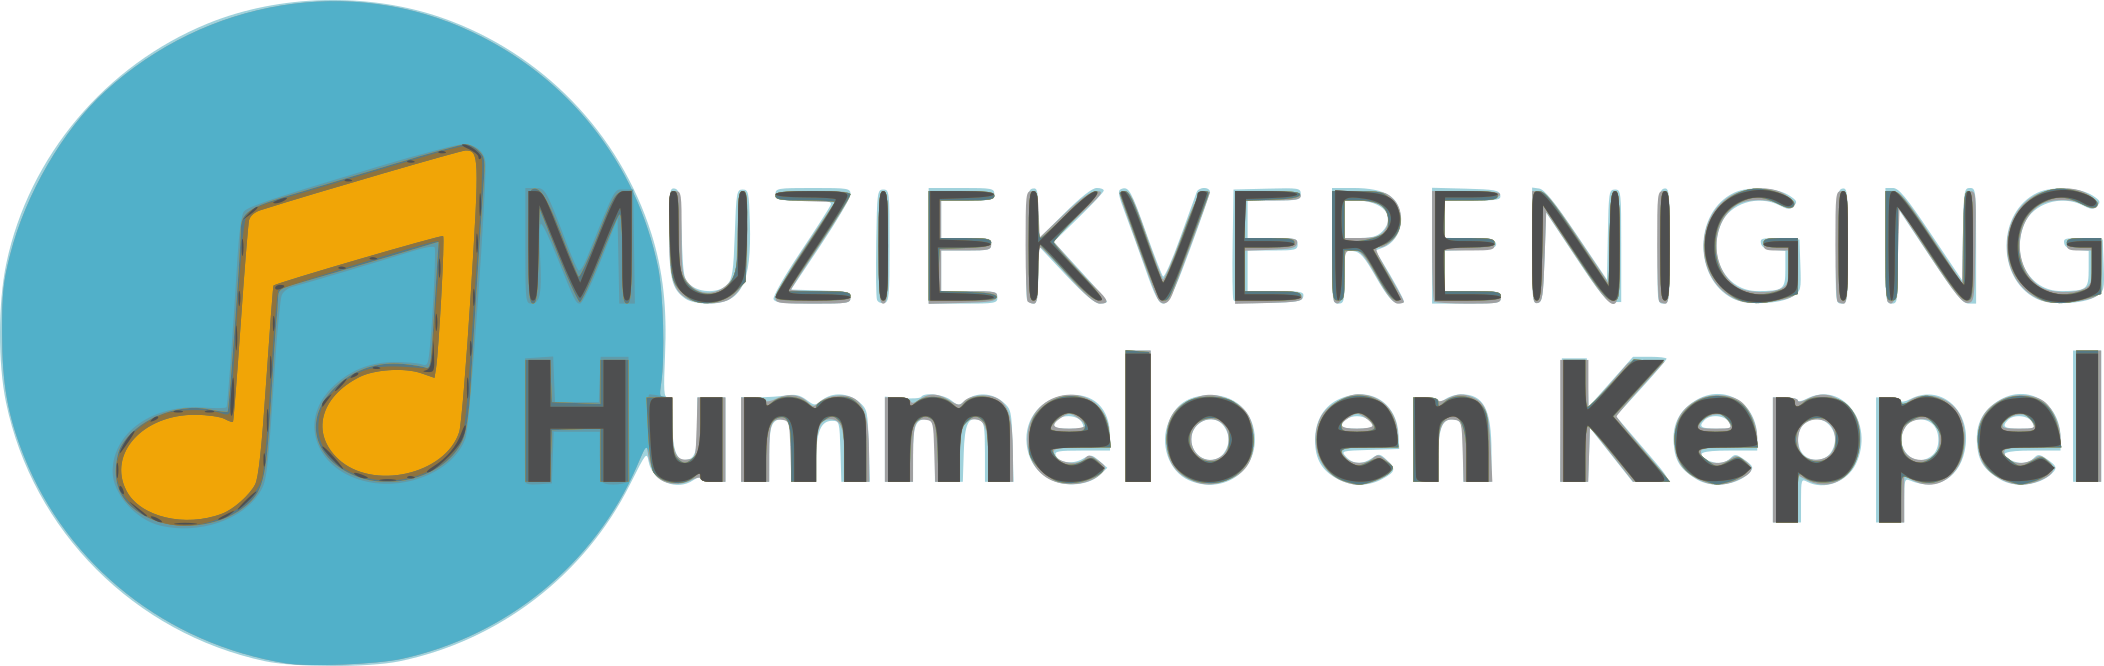 Muziekvereniging Hummelo en Keppel